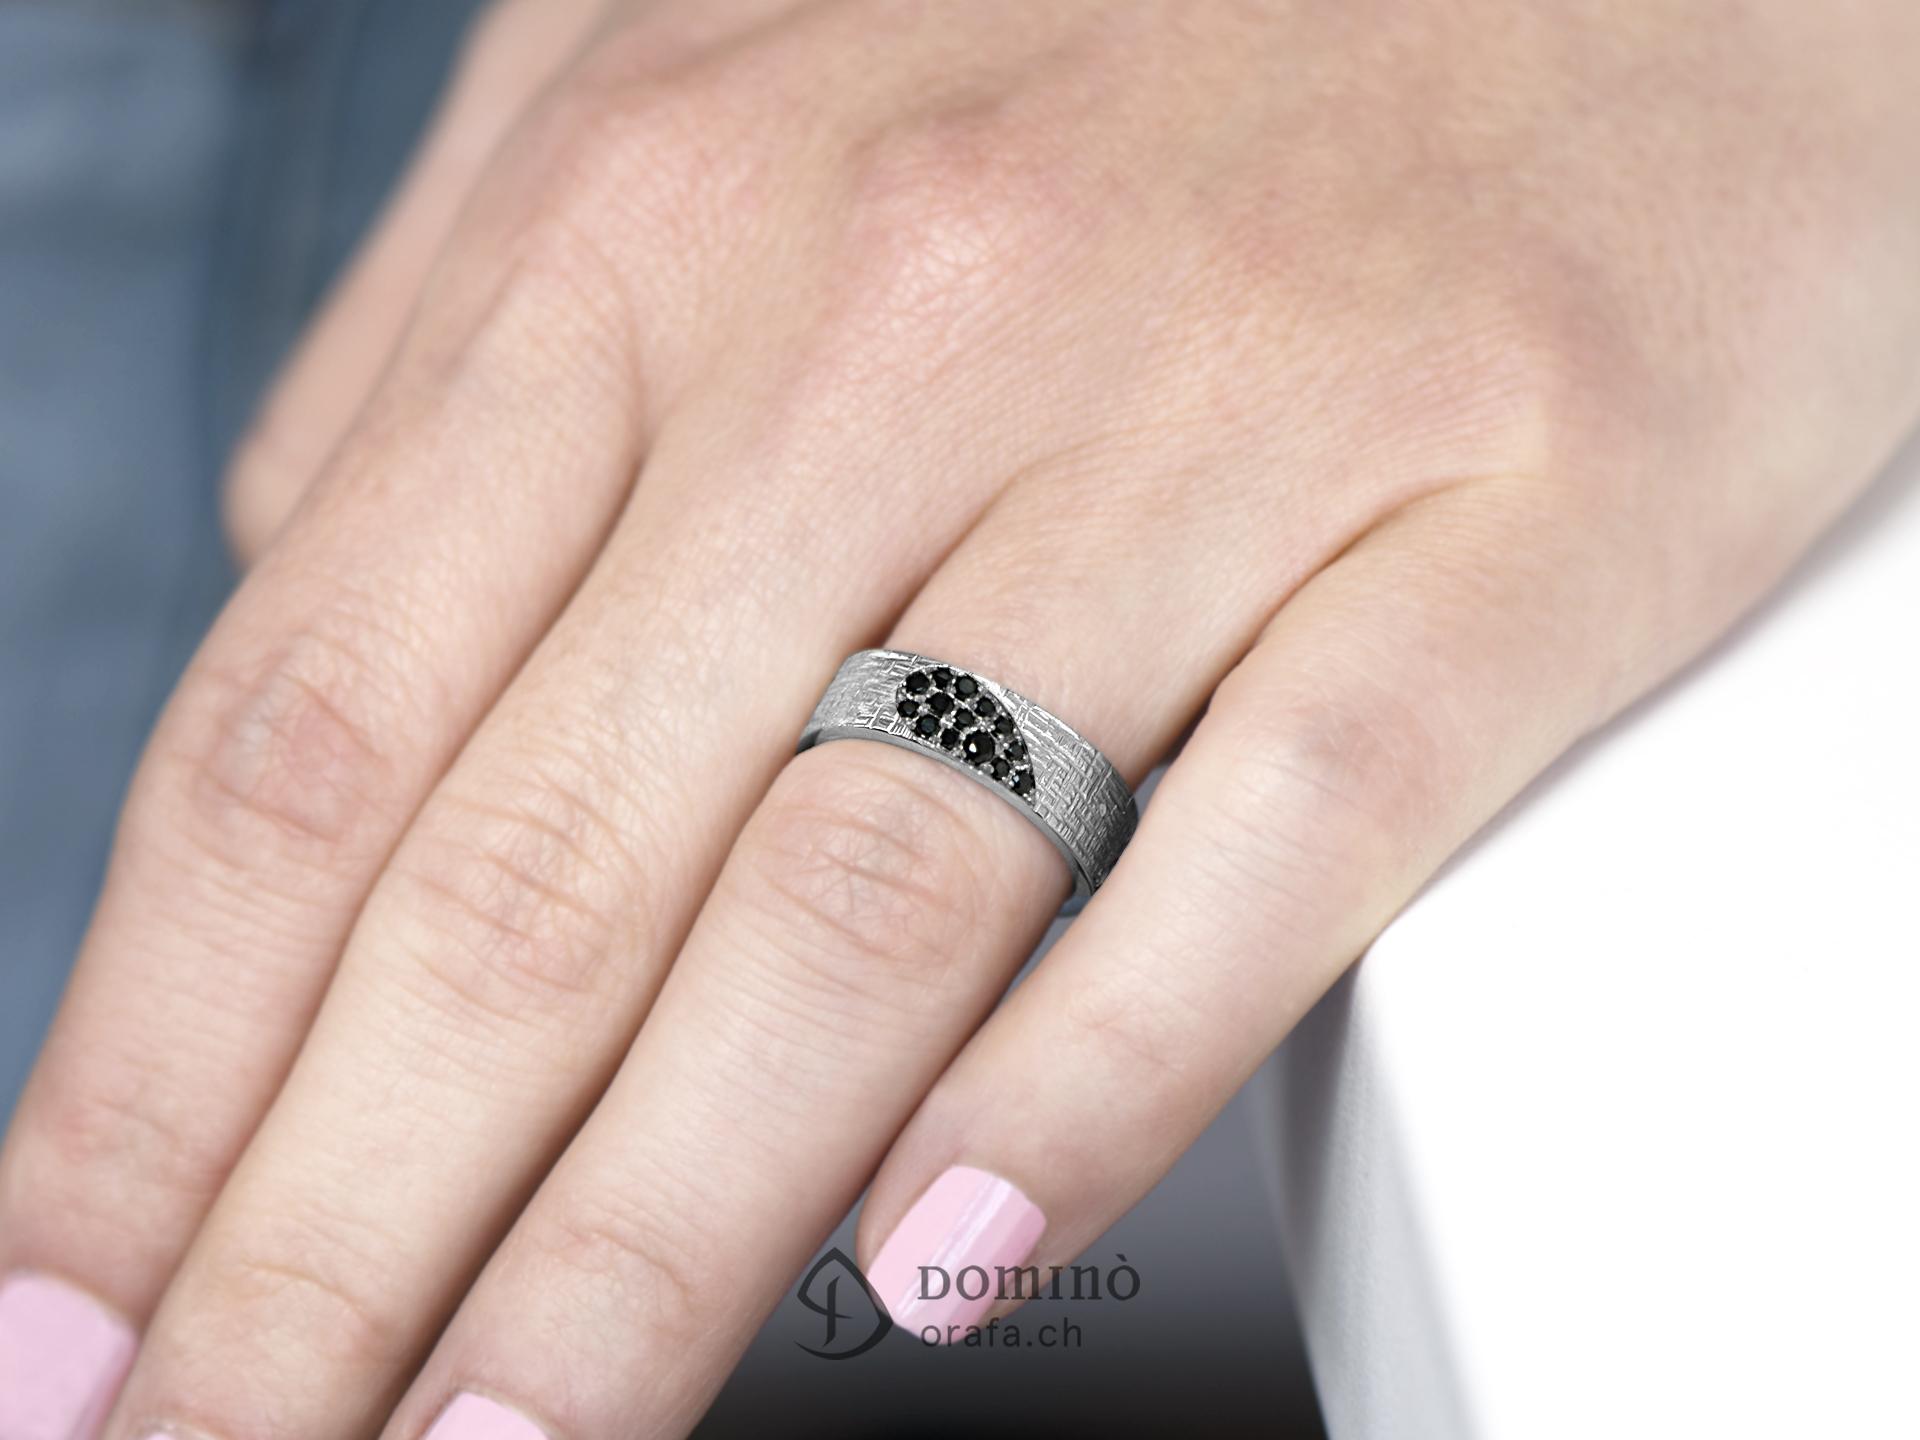 fedi-nuziali-linee-incrociate-cuore-diamanti-incolore-neri-3